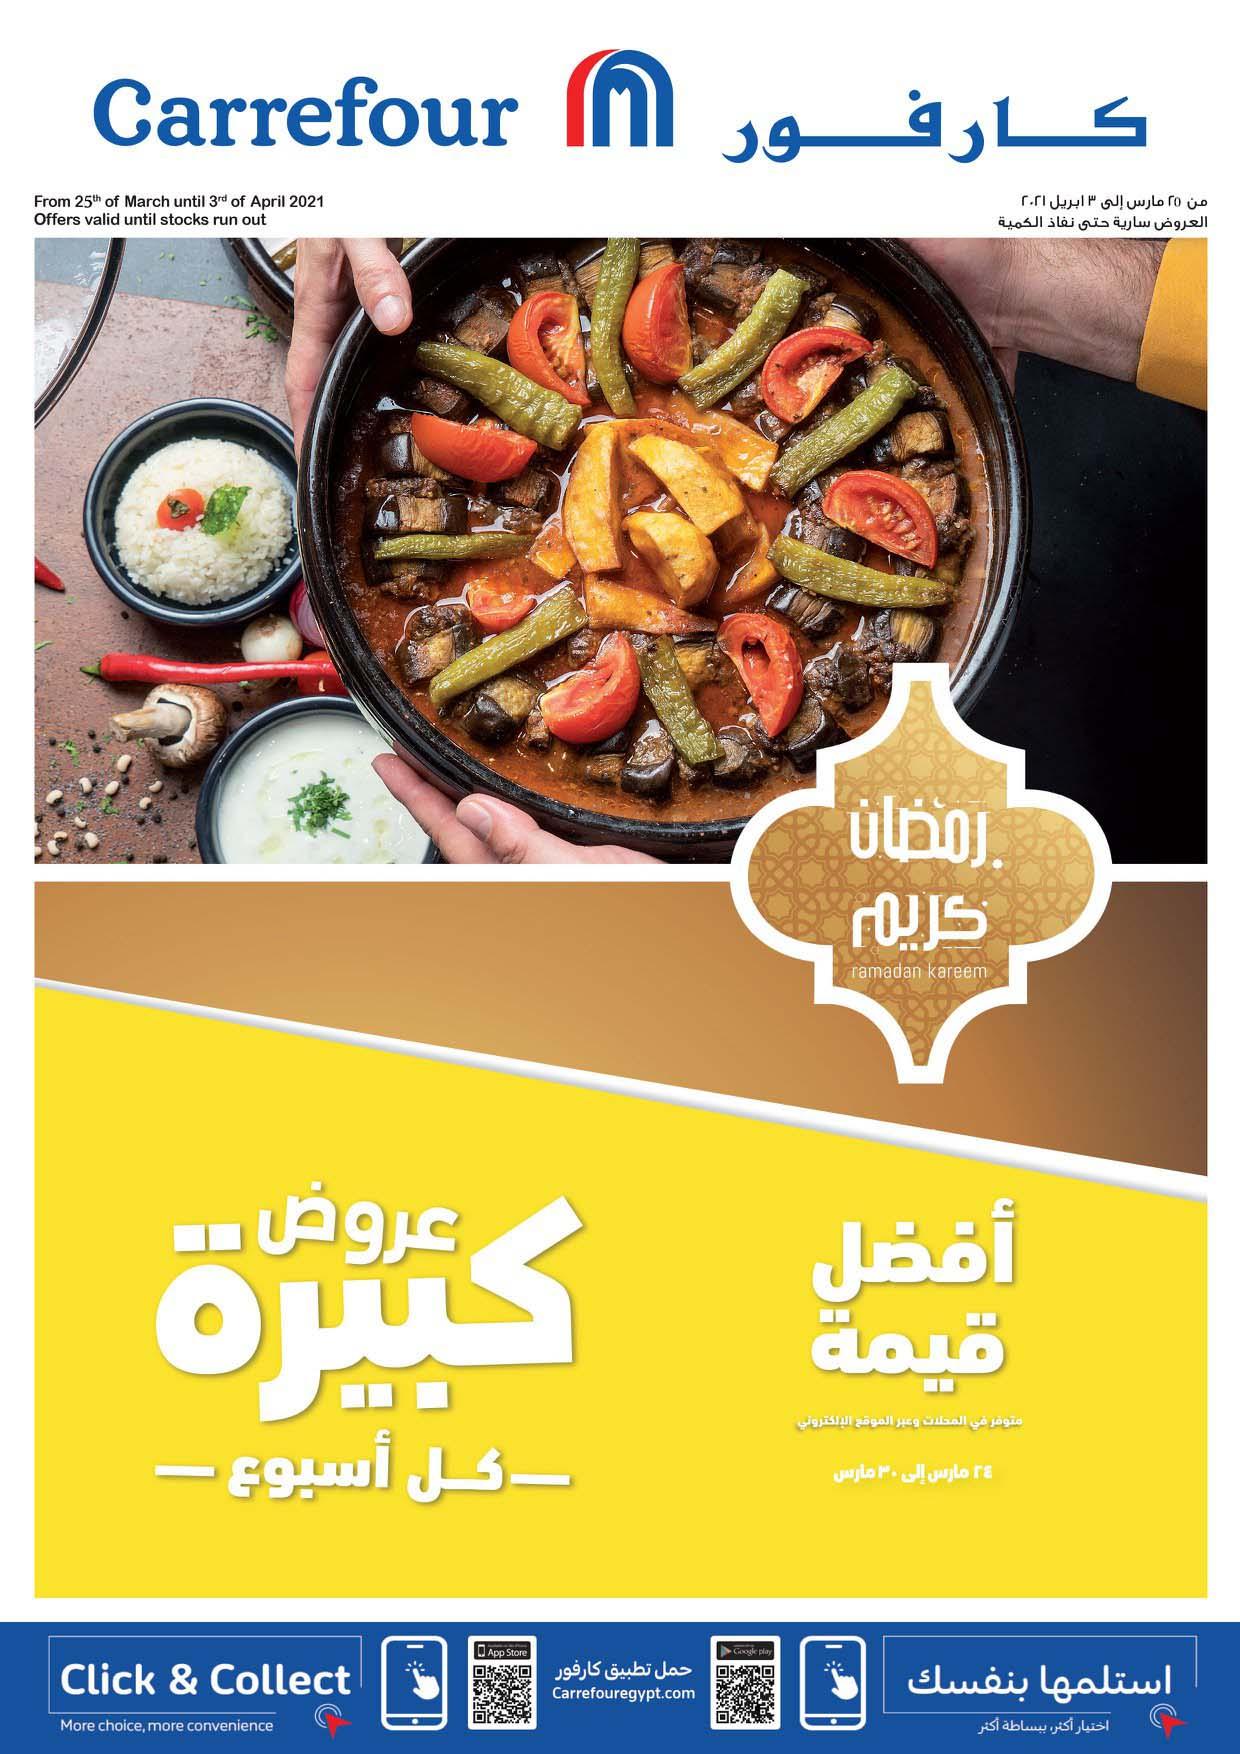 عروض كارفور مصر من 25 مارس حتى 3 ابريل 2021 عروض رمضان